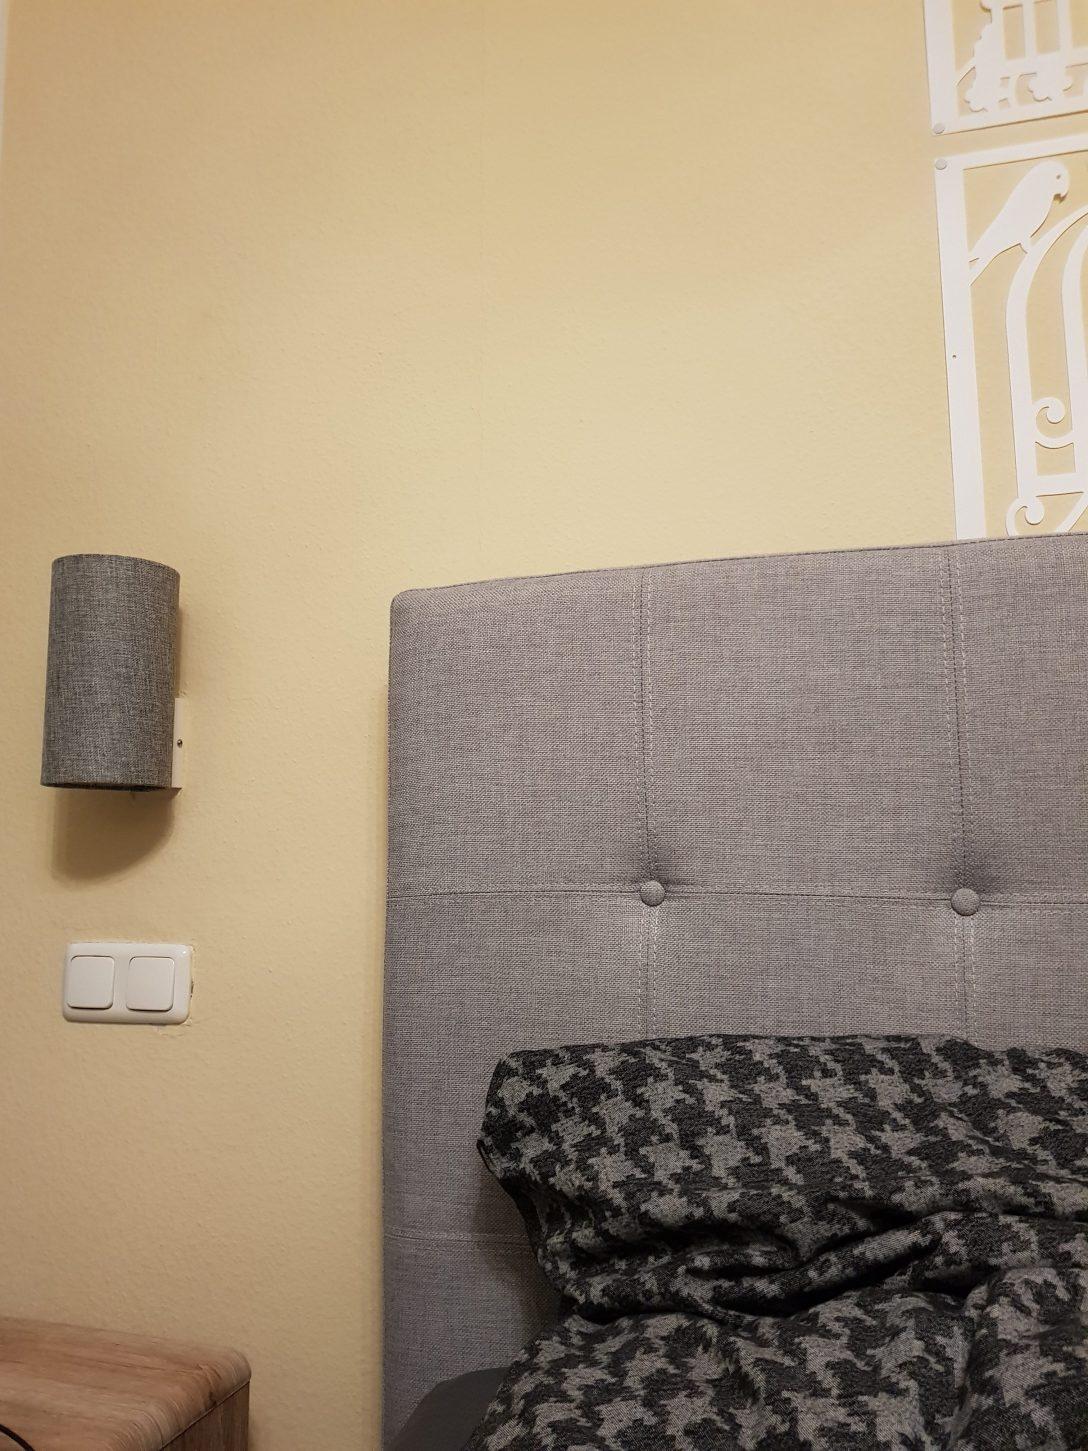 Large Size of Schlafzimmer Wandlampen Led Wandlampe Wandleuchte Dimmbar Holz Design Modern Mit Schalter Schwenkbar Ikea Leselampe Philips Hue Komplettes Massivholz Stehlampe Schlafzimmer Schlafzimmer Wandlampe